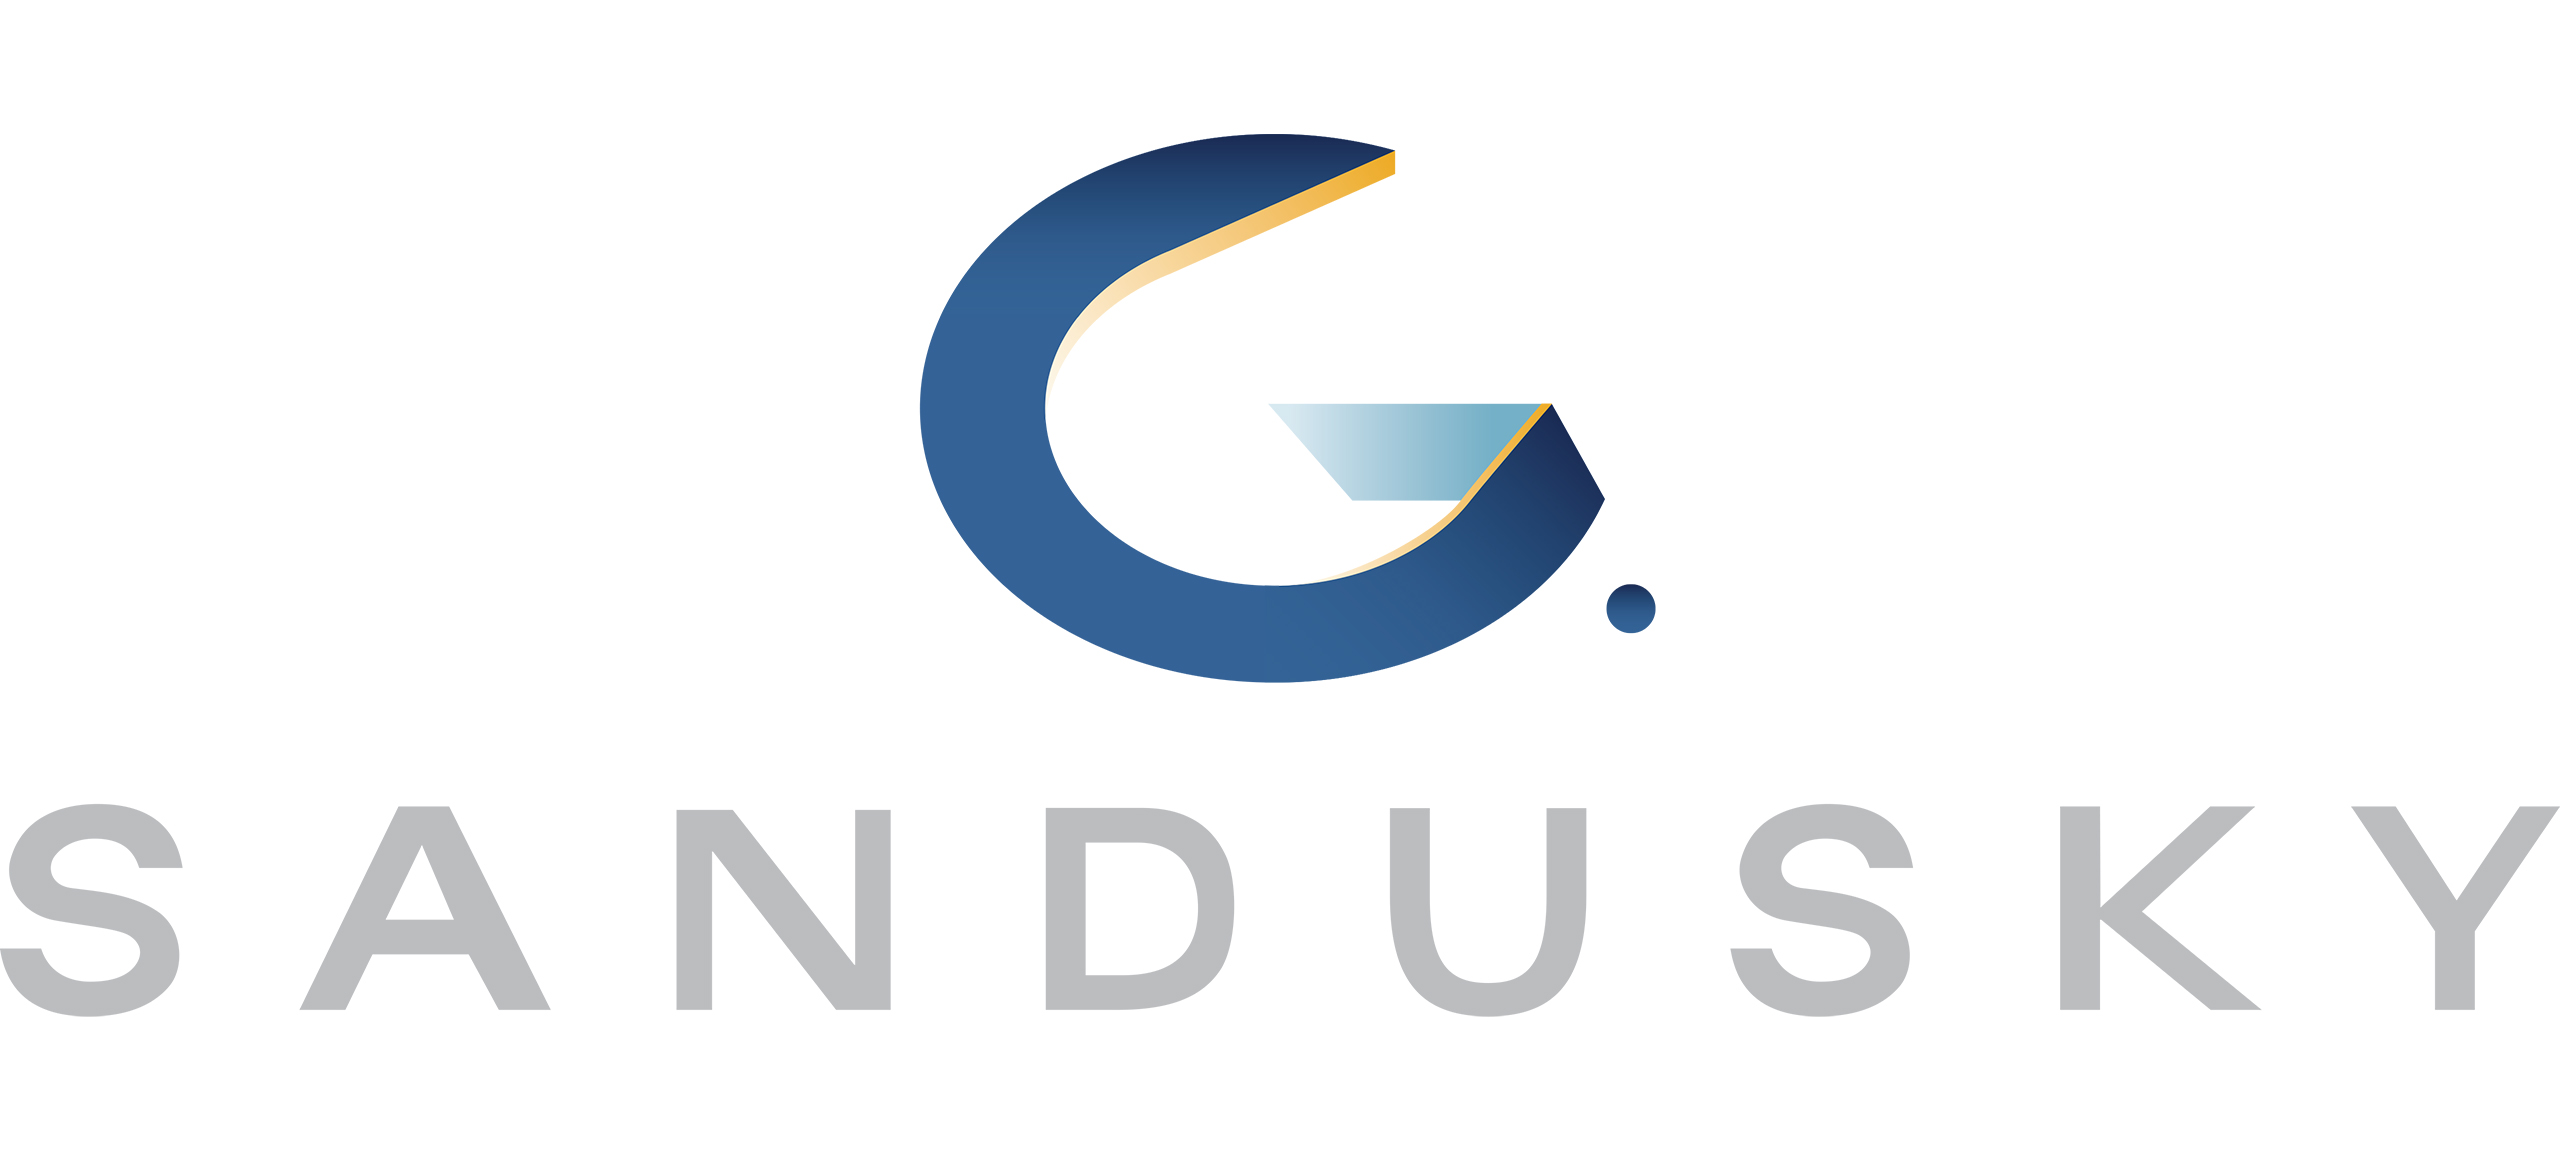 Sandusky Group logo